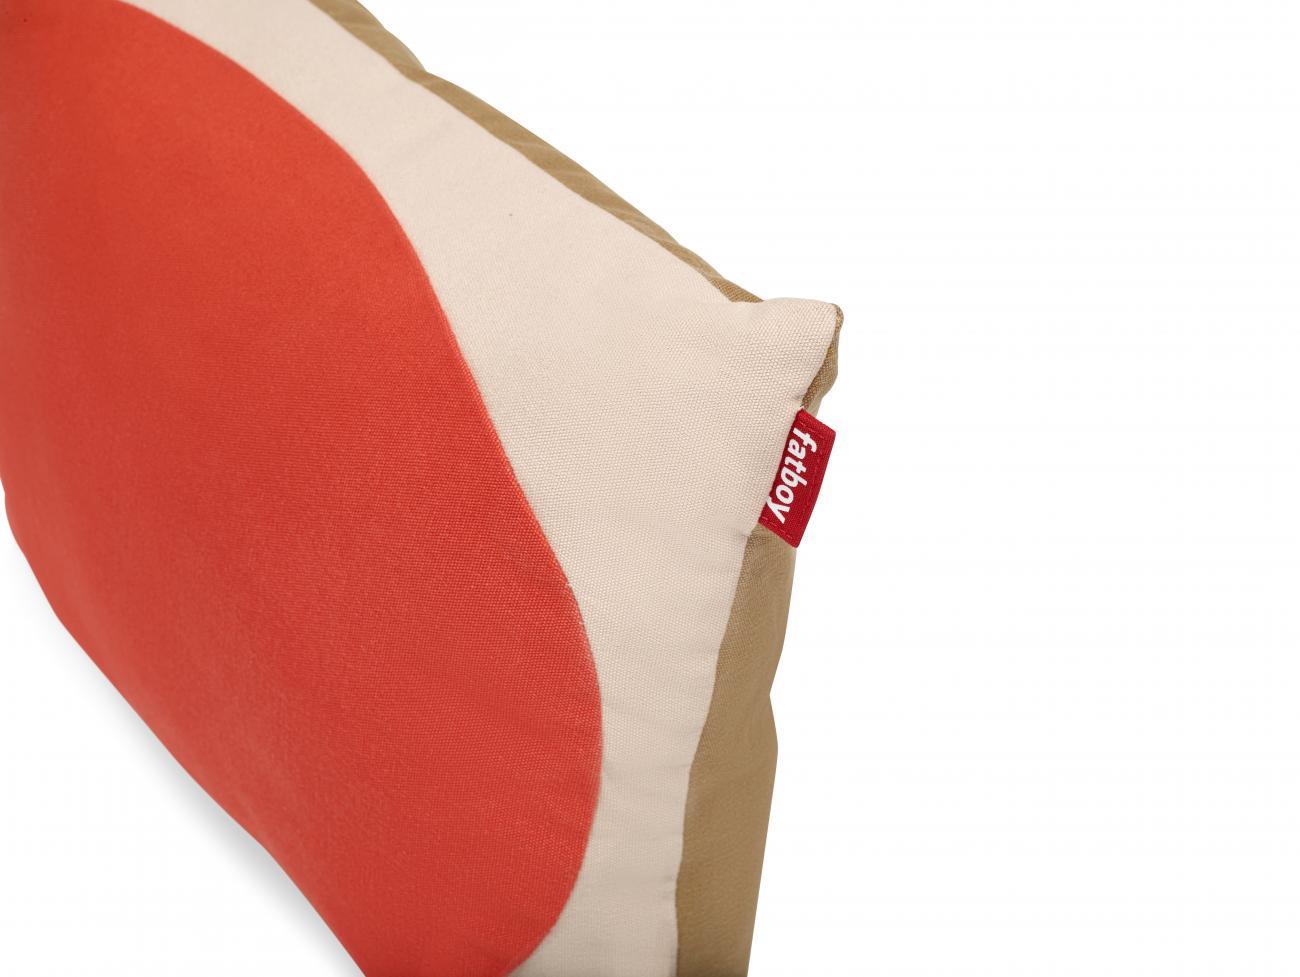 https://www.fundesign.nl/media/catalog/product/f/a/fatboy_pop-pillow_poppy_side_srgb.jpg